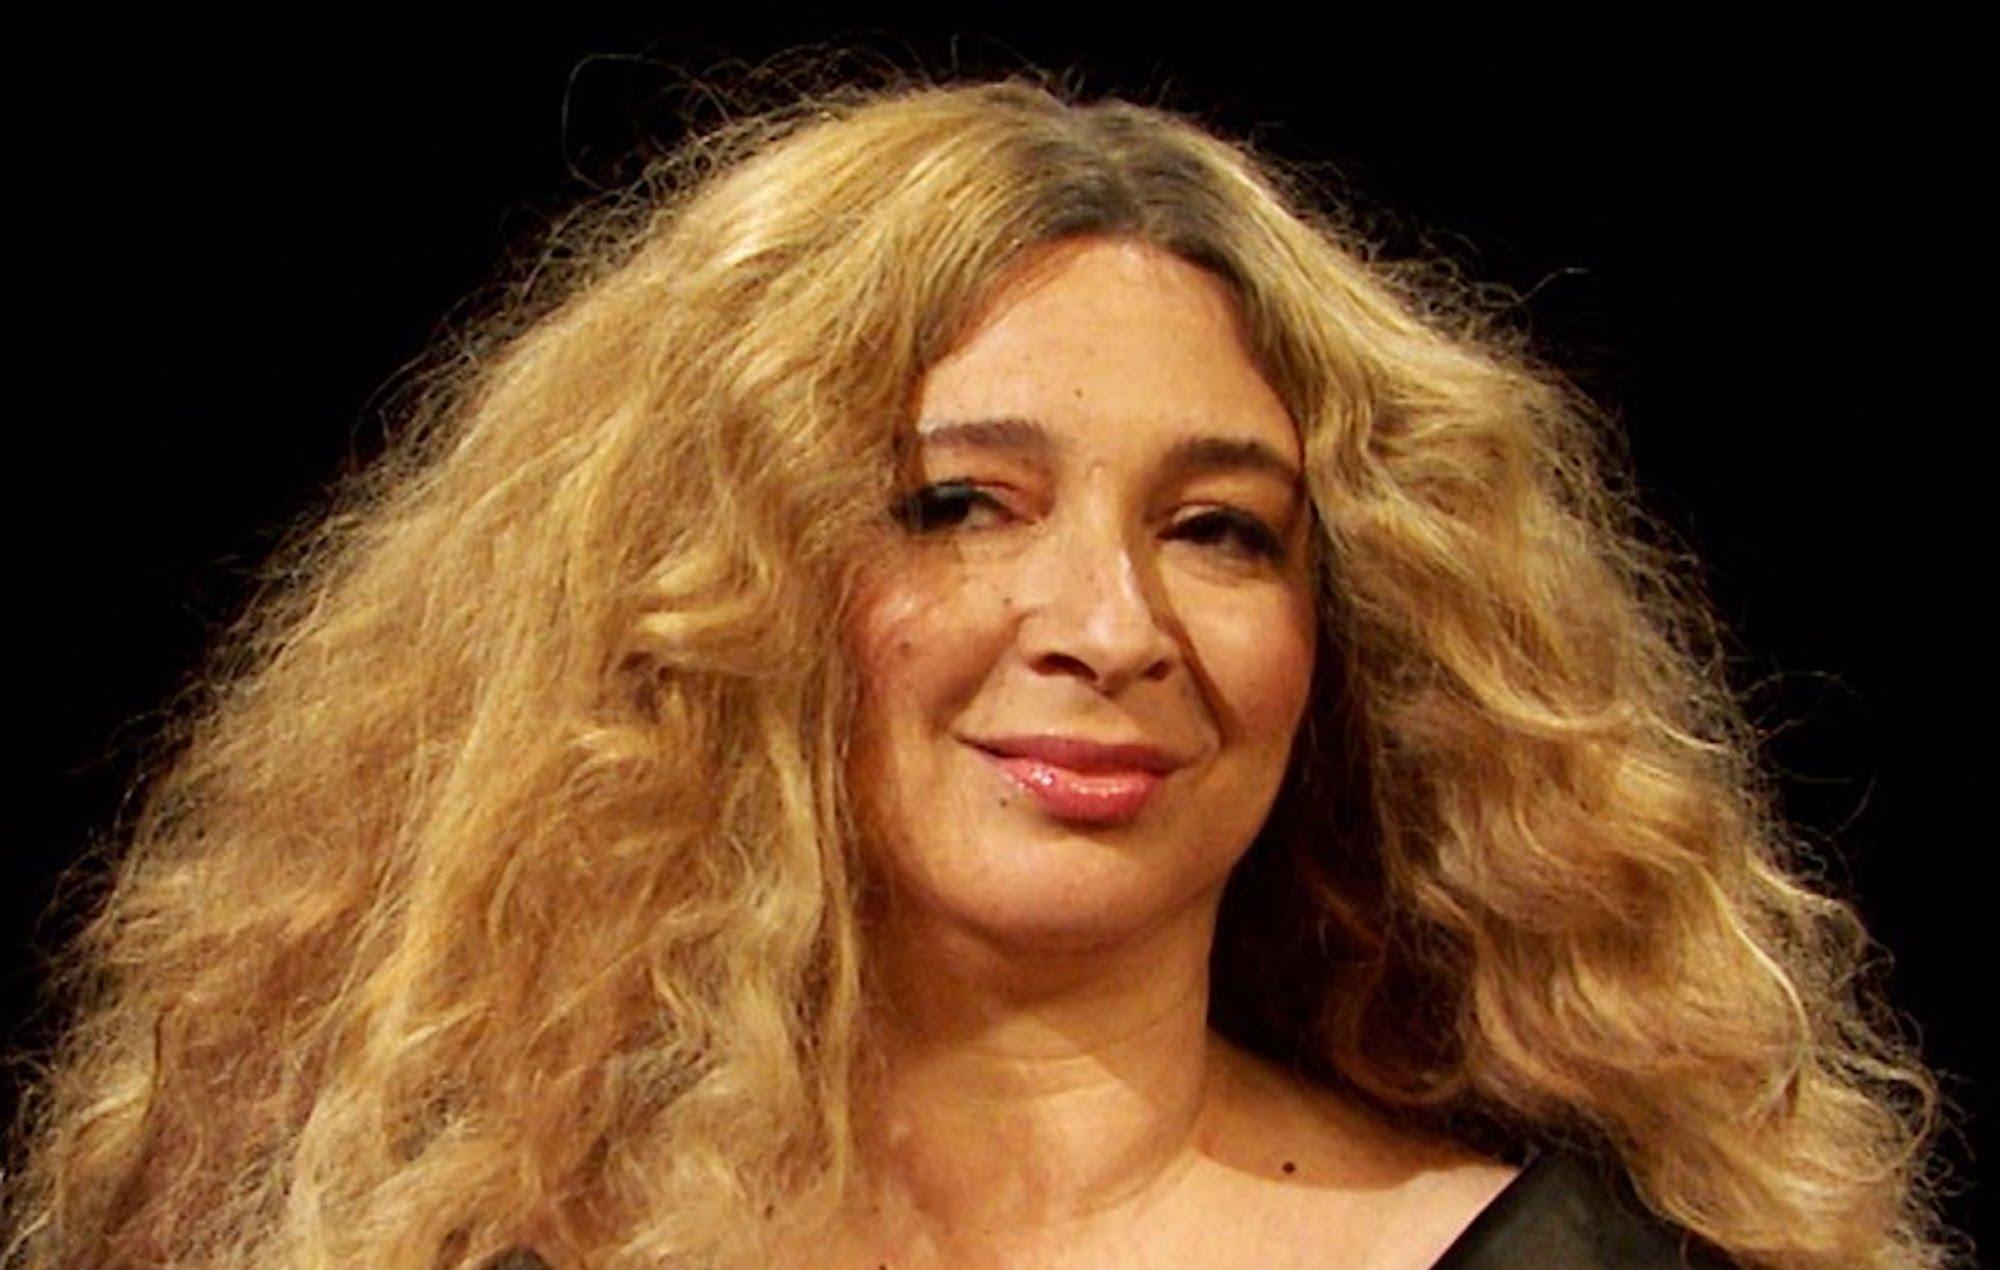 Maya Rudolph will play Beyoncé taking on 'Hot Ones' on 'SNL'